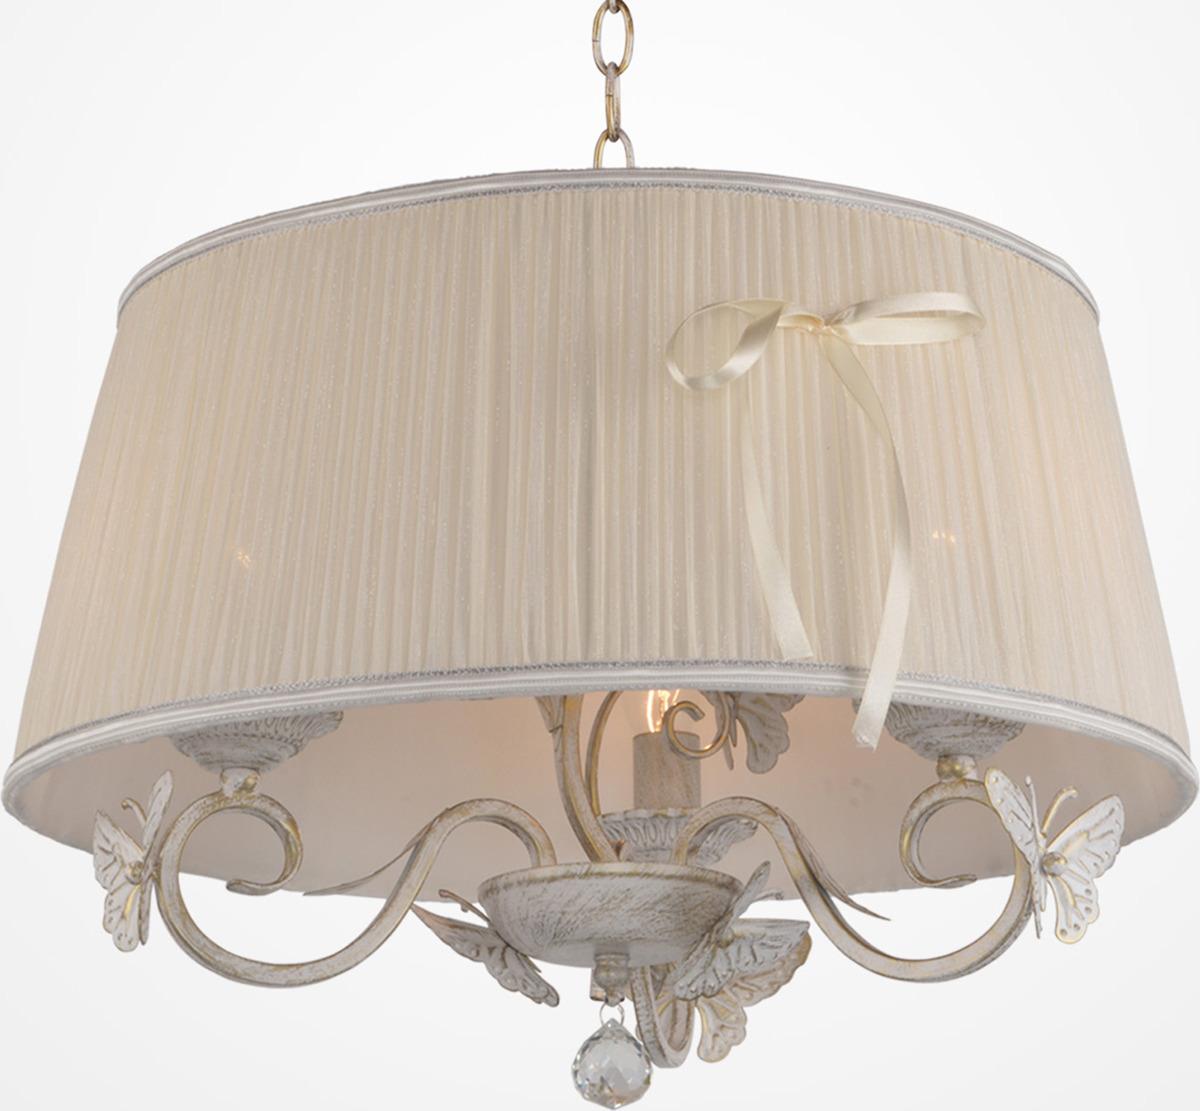 Подвесной светильник Rivoli Farfalla, 3 х E14, 40 Вт, 2014-203 все цены